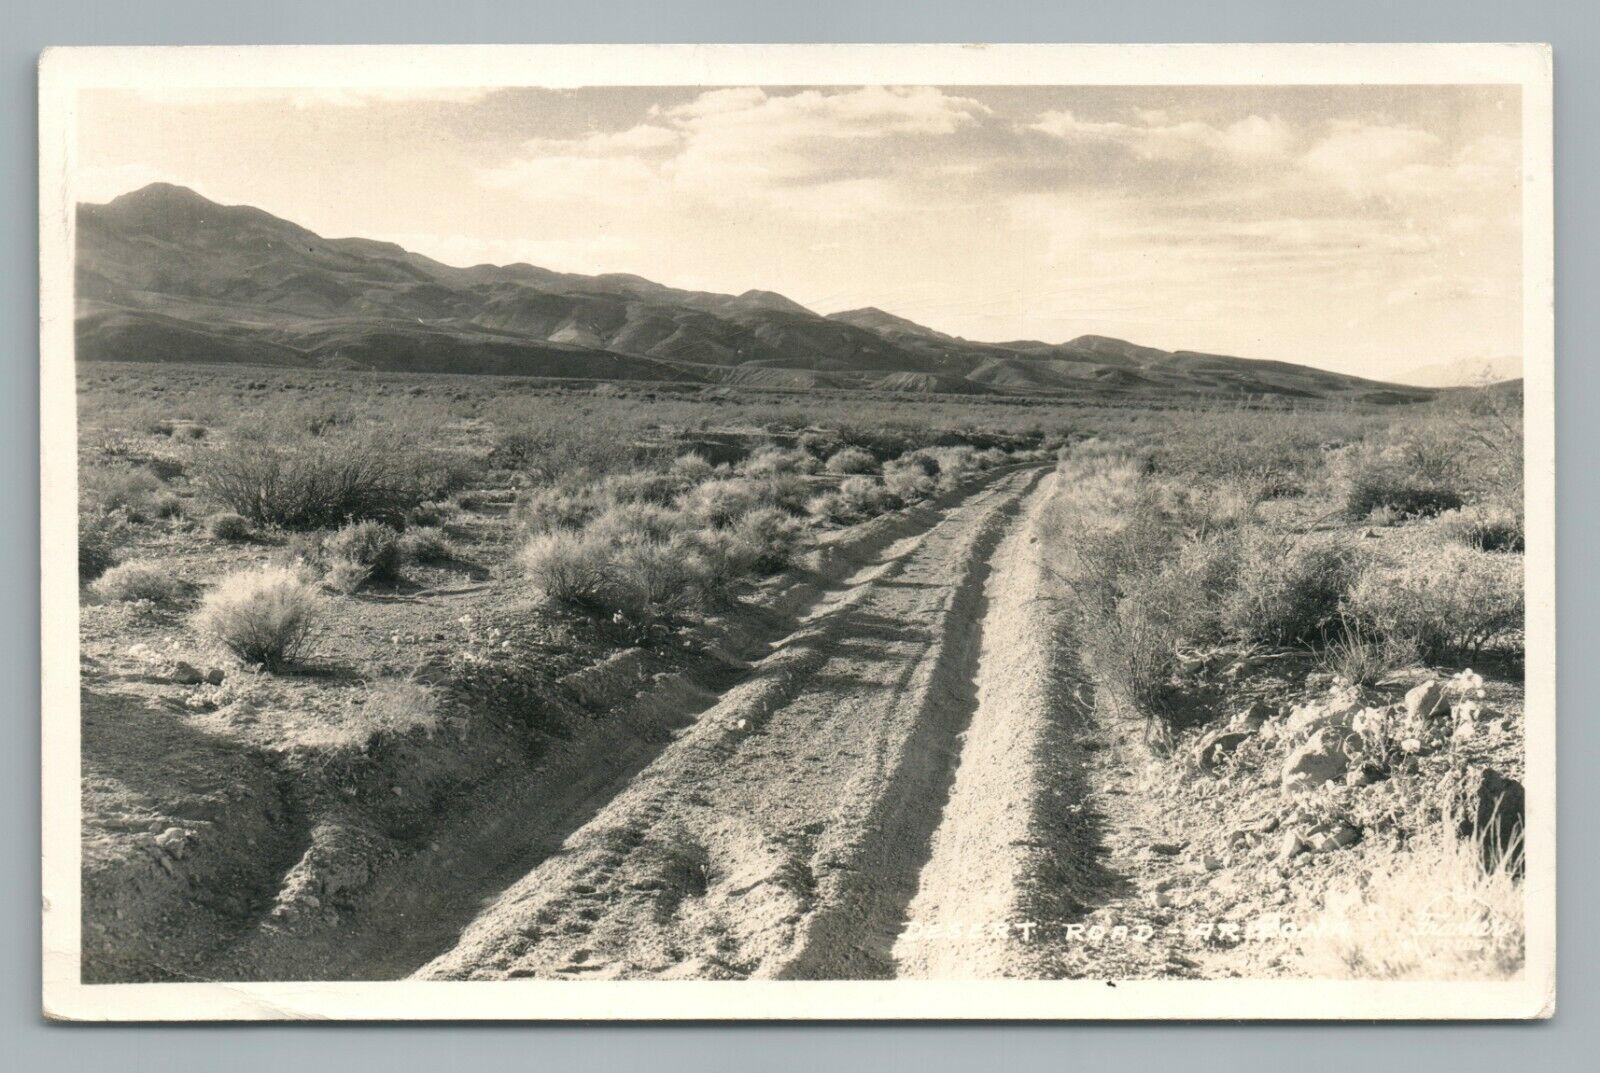 Arizona Rppc Frashers Vintage Photo